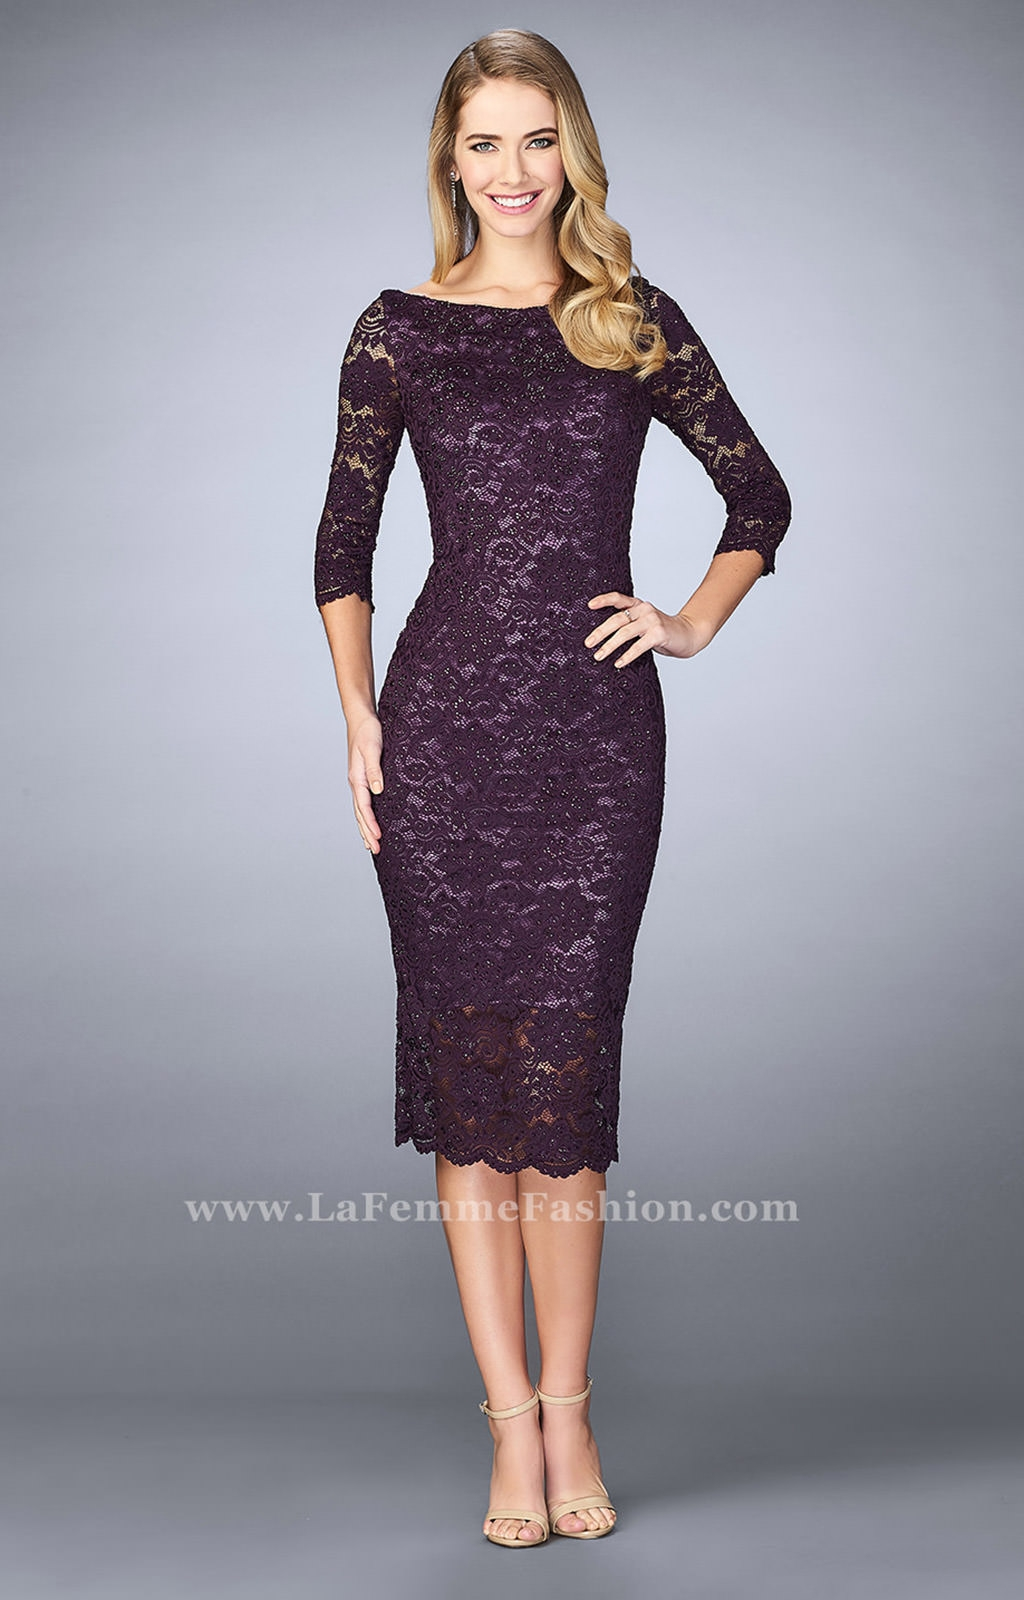 La Femme 24875 3 4 Sleeve Fitted Tea Length Dress Prom Dress